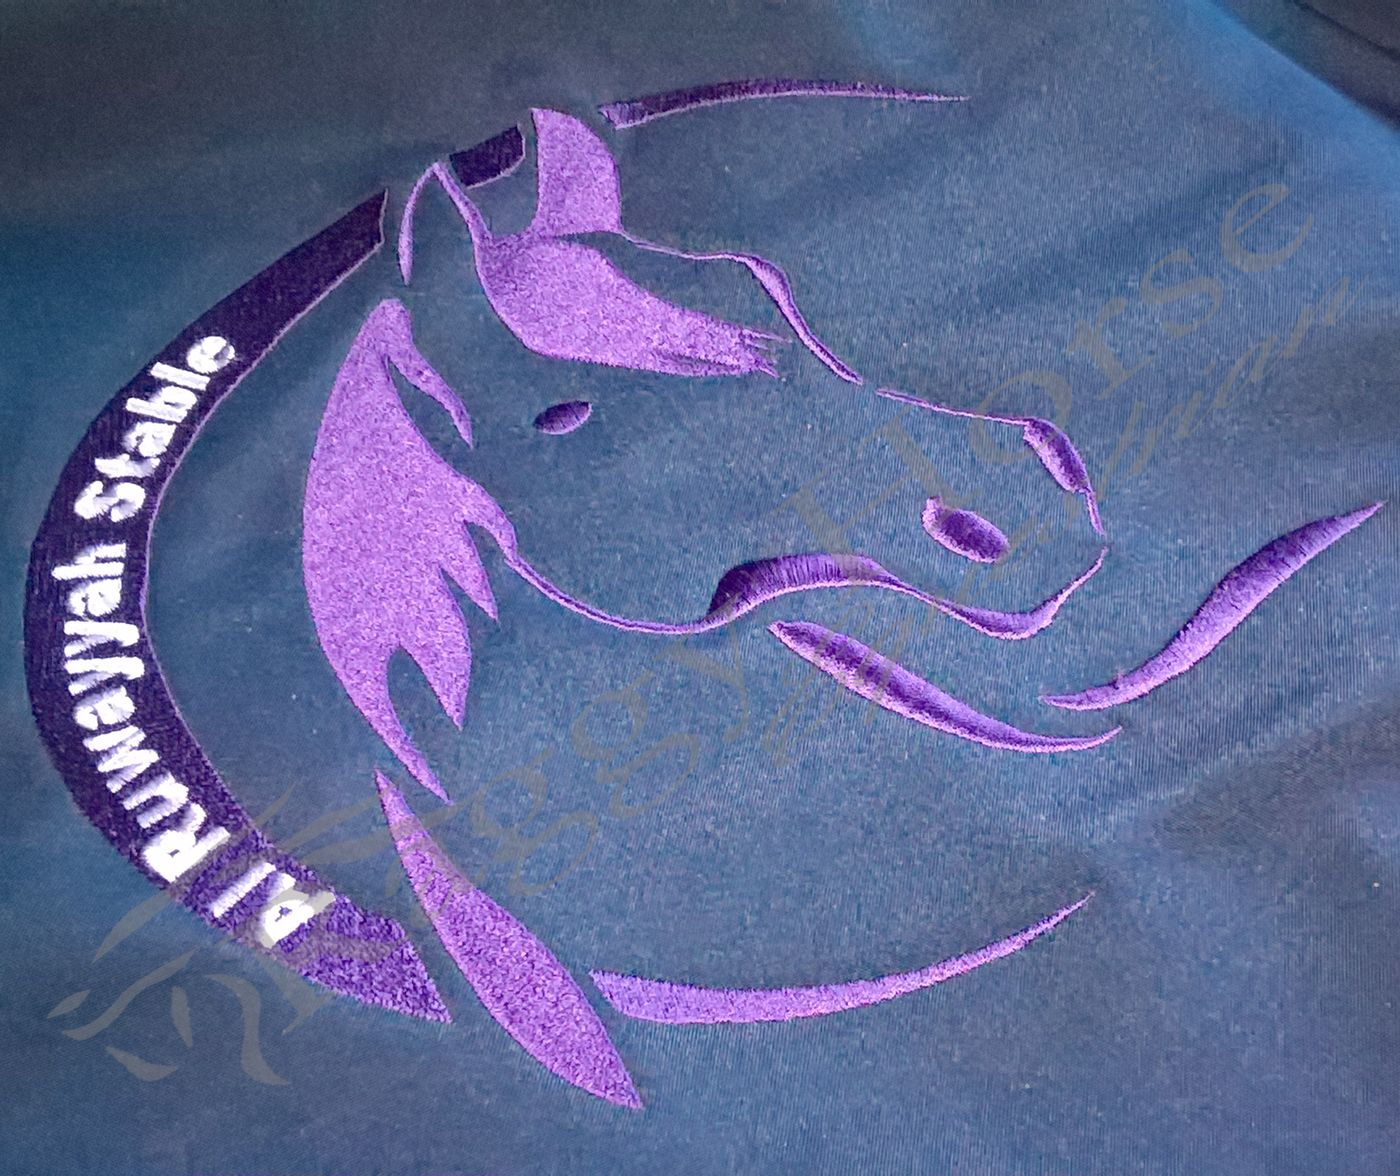 Custom Design to Softshell Jacket